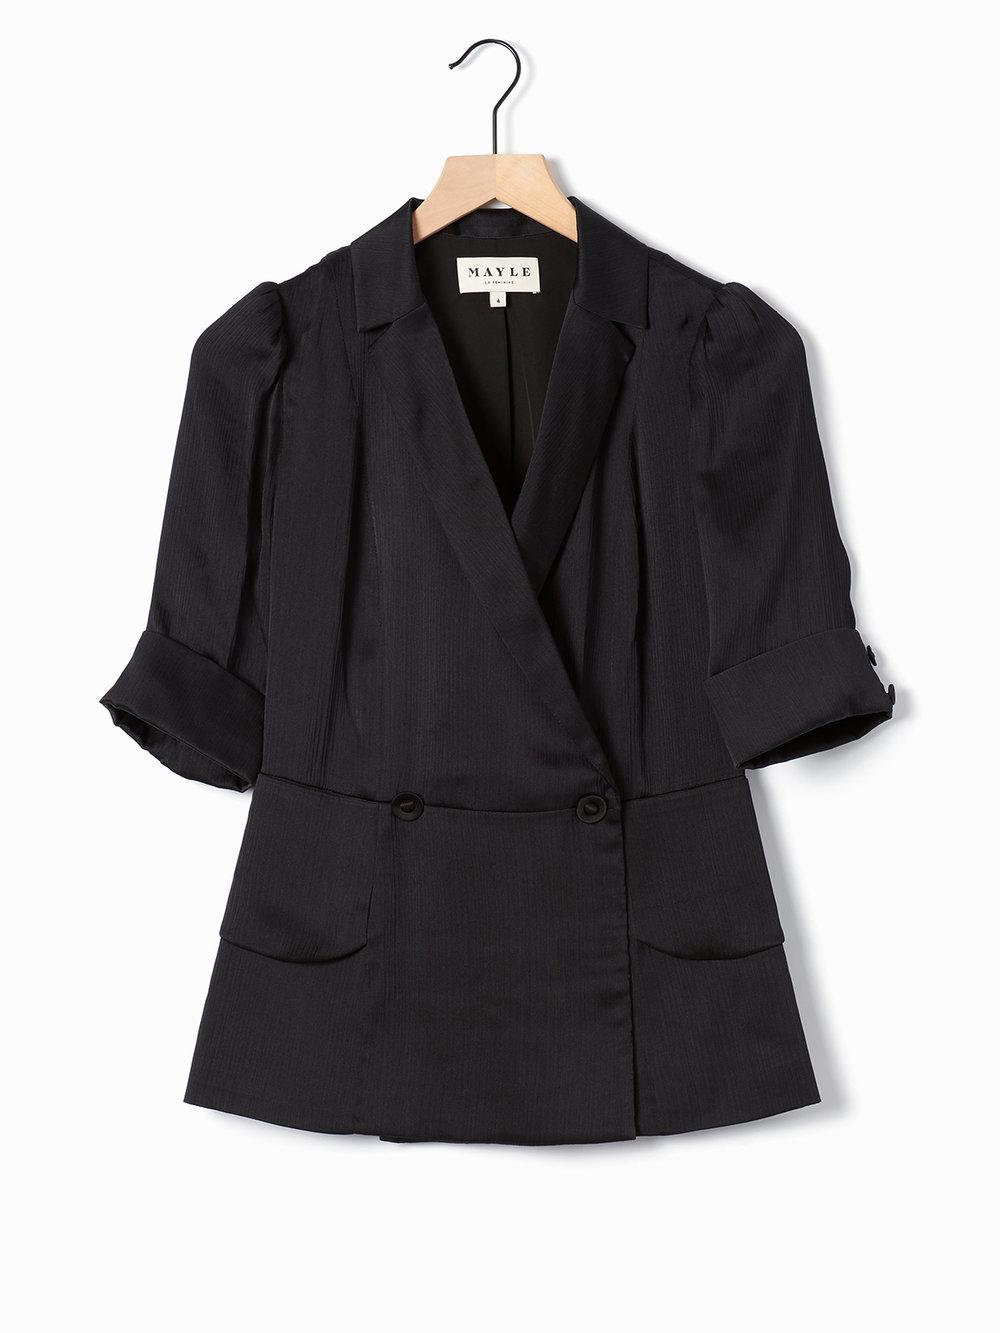 French_Italian_Mayle_Vita_Jacket_Silk_Black_01.jpg